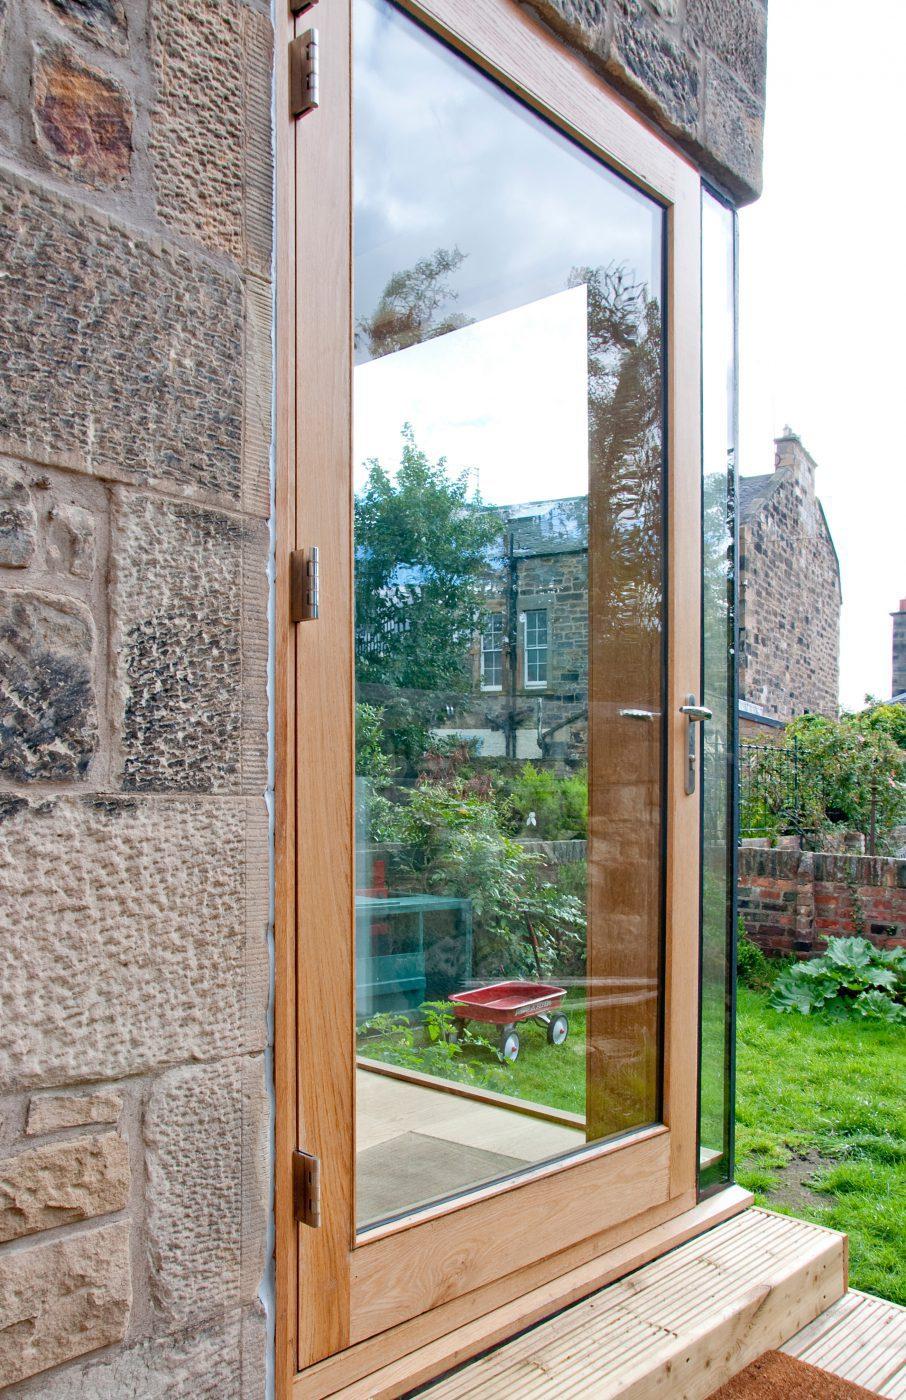 Bath Street Window photography